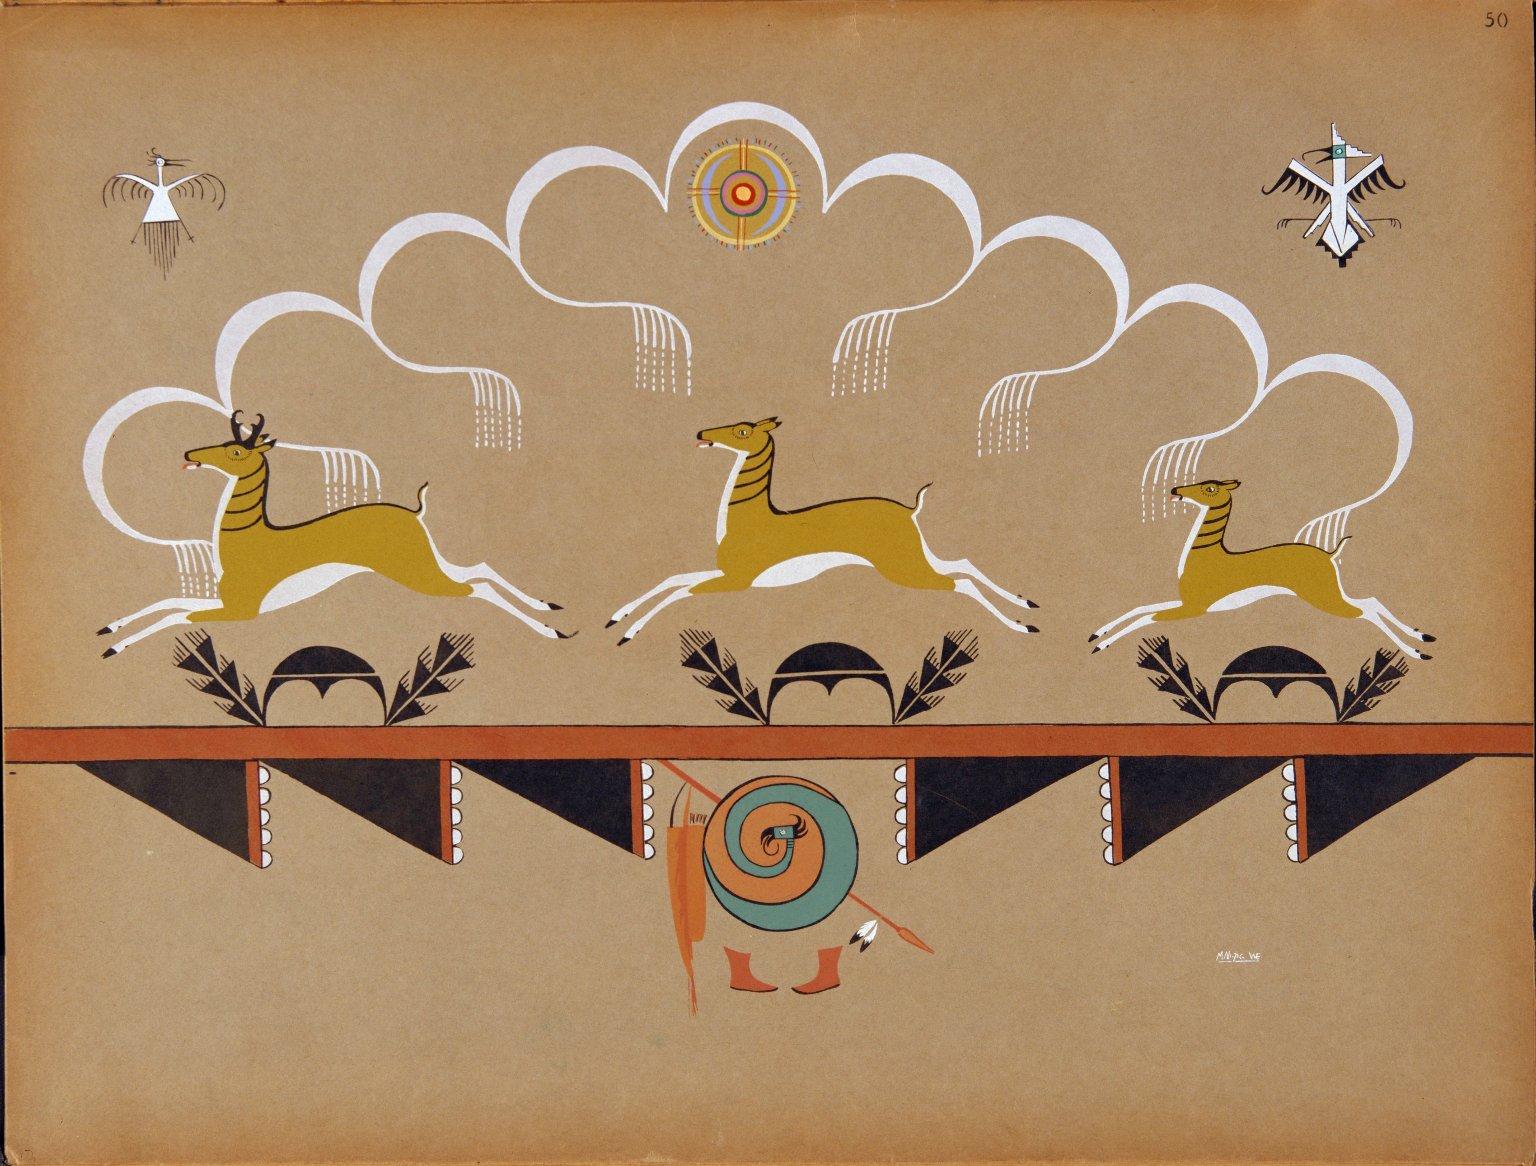 Antelopes Running Under Rainy Skies